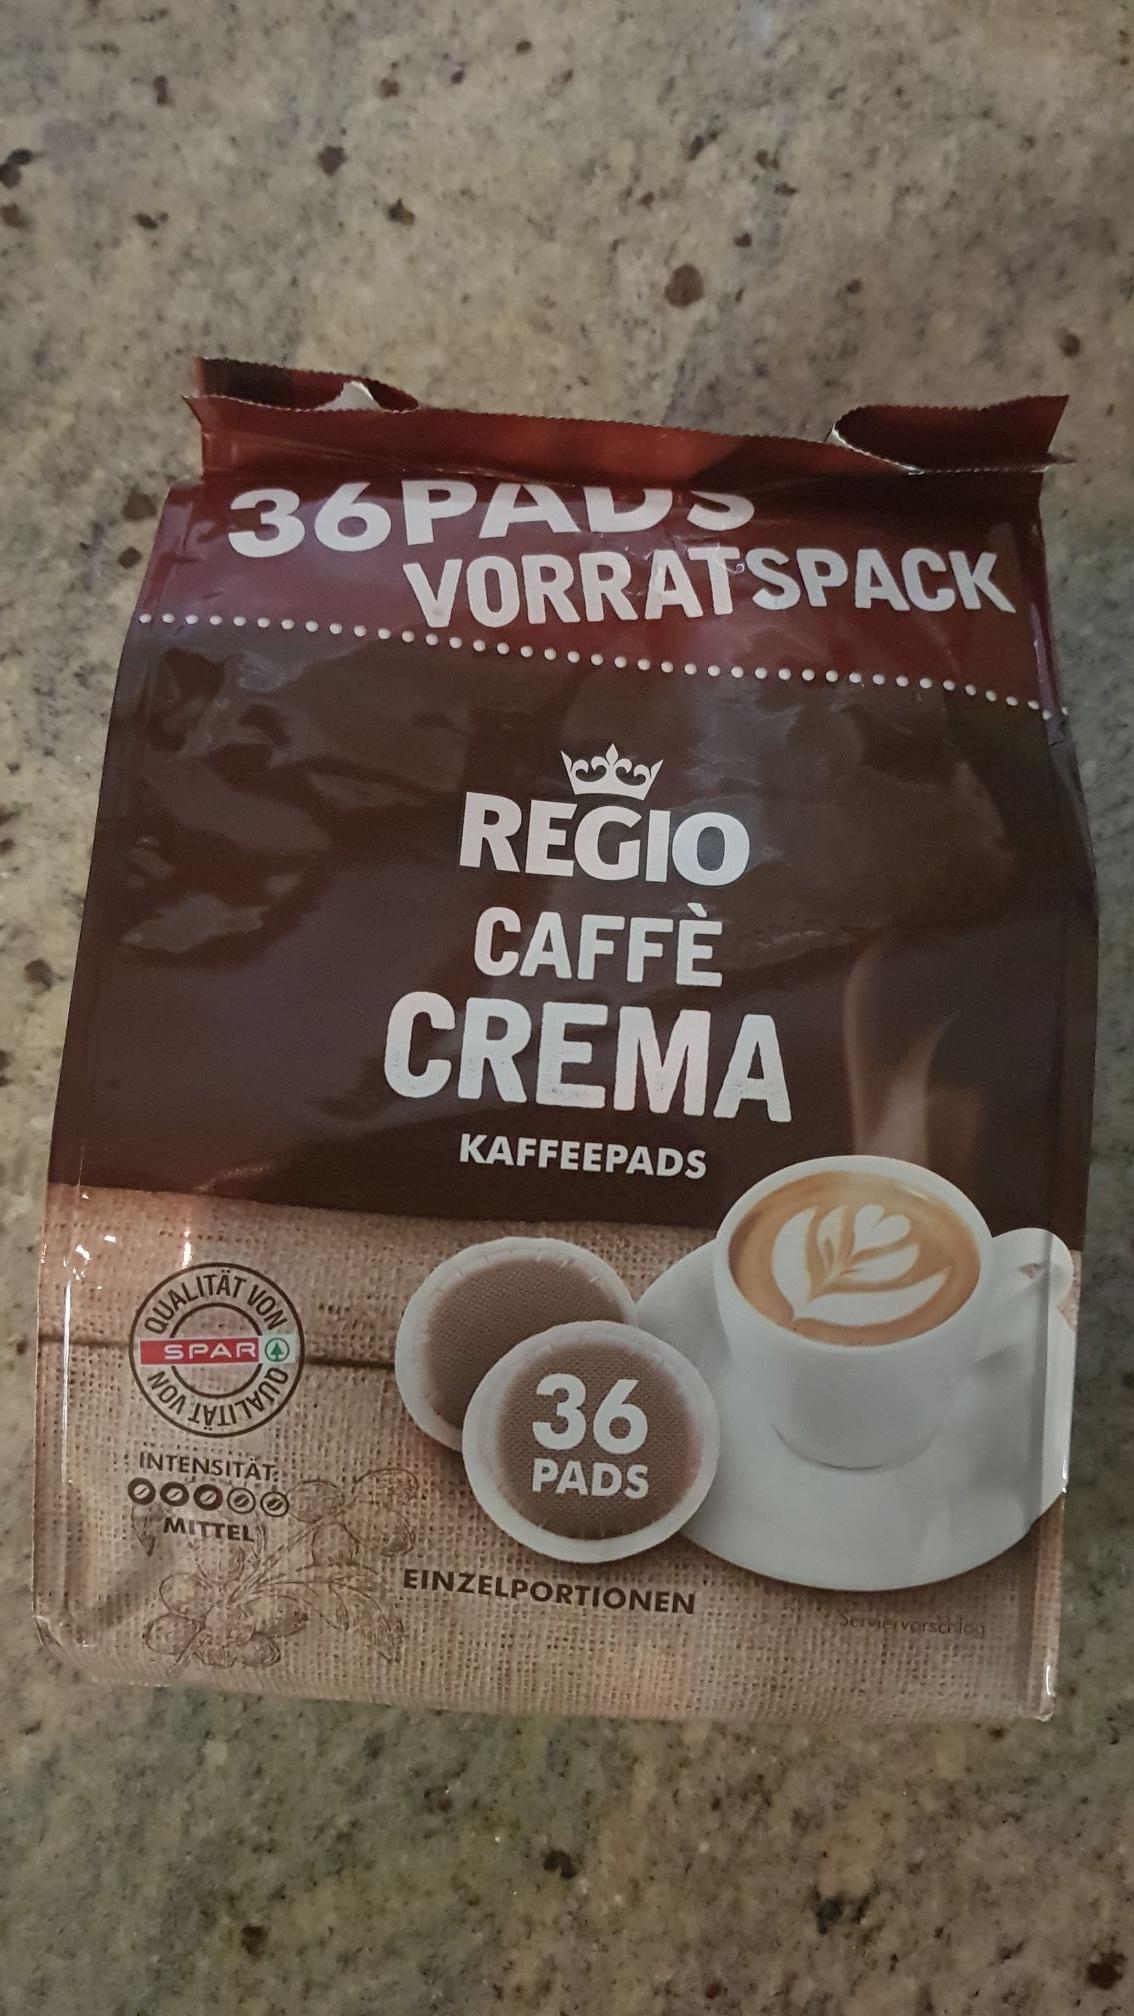 REGIO CAFFE 36 Kaffeepads beim Spar